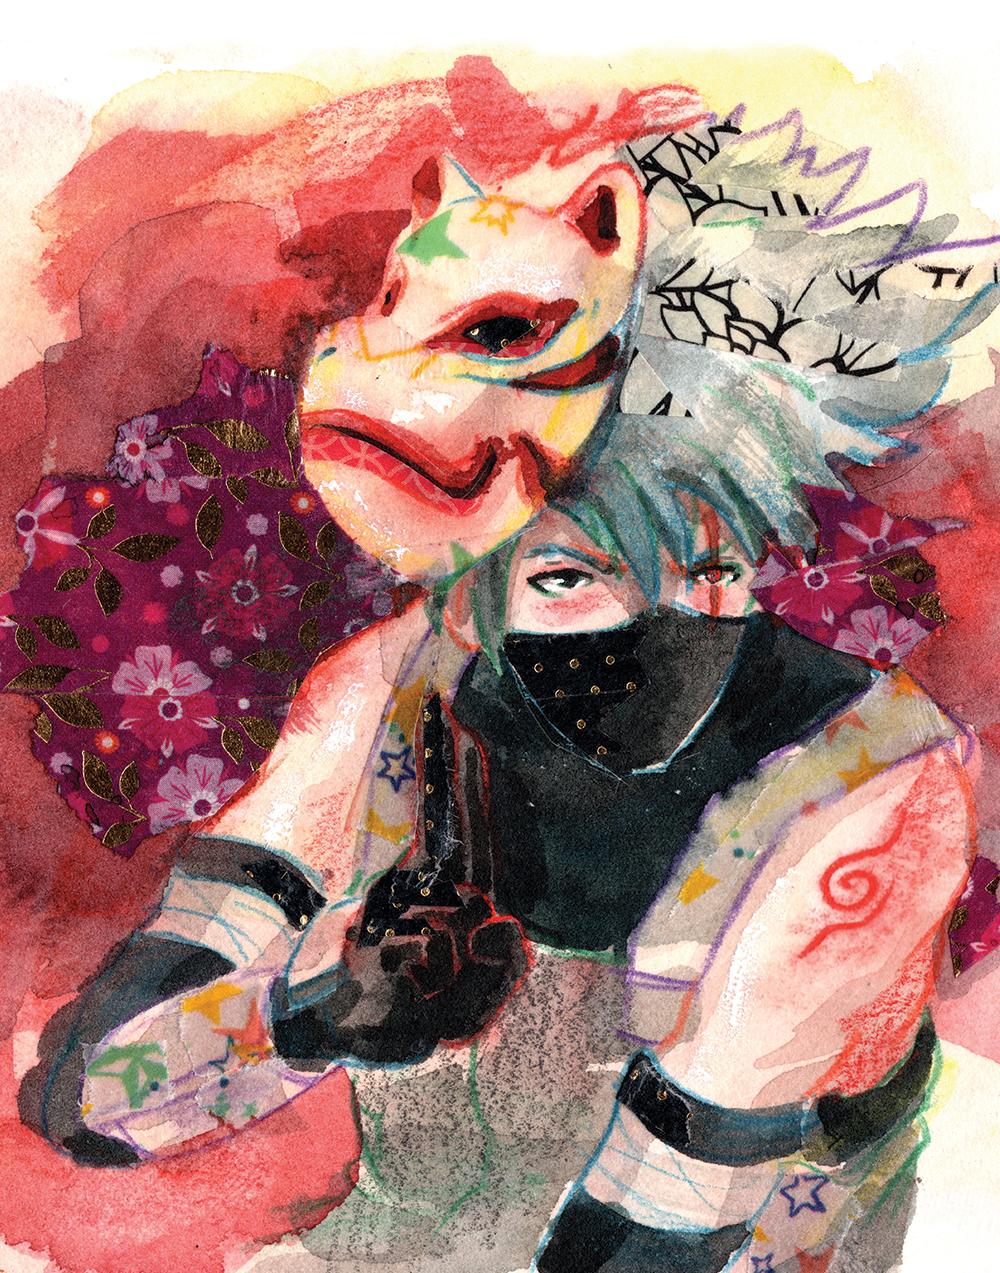 Colorful Kakashi web.jpg